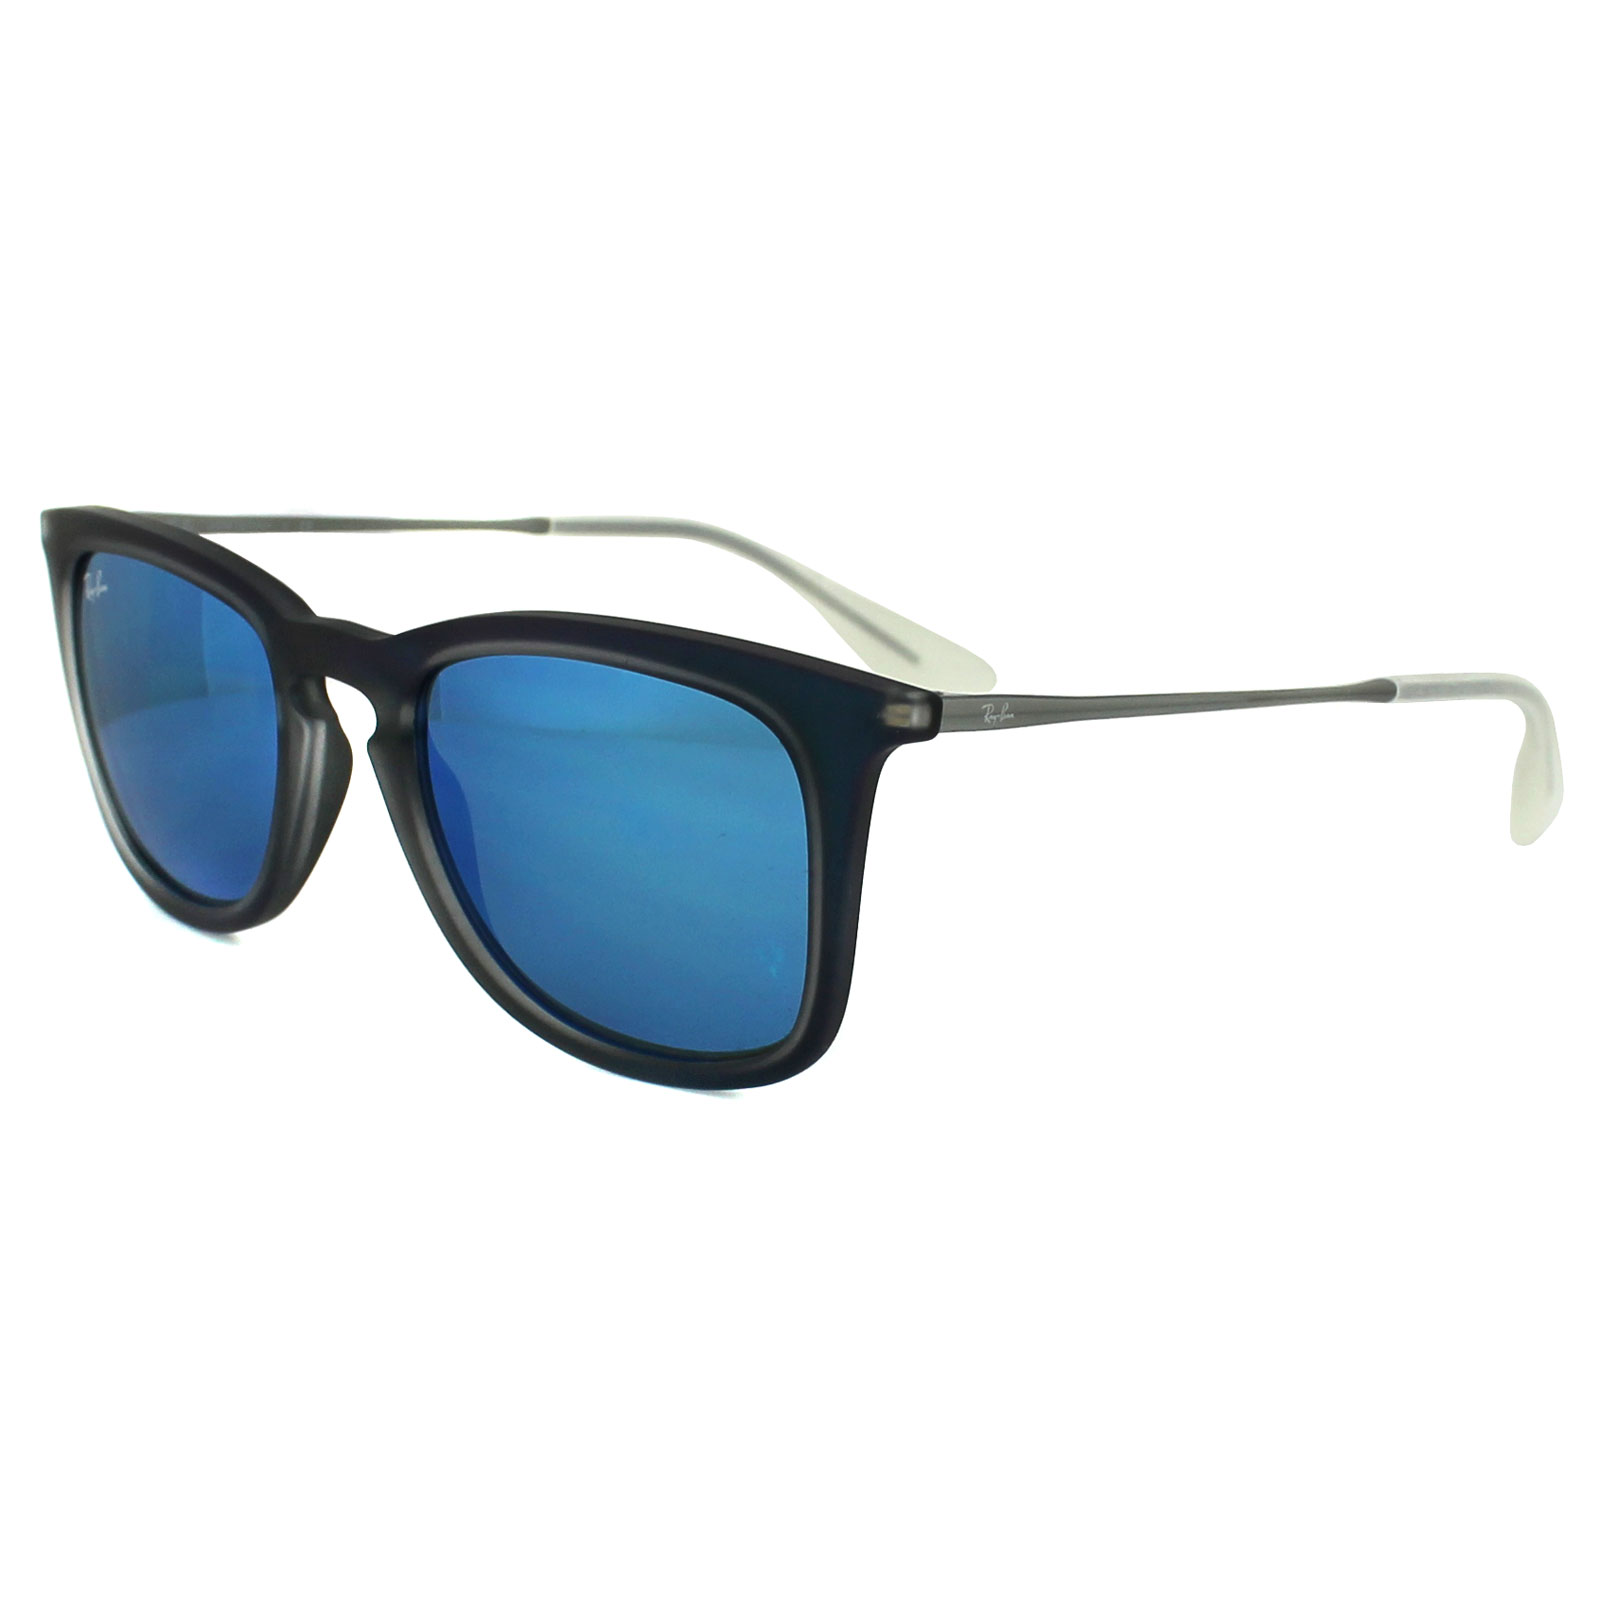 c384a9b1bbf Sentinel Ray-Ban Sunglasses 4221 617055 Blue   Gunmetal Blue Mirror